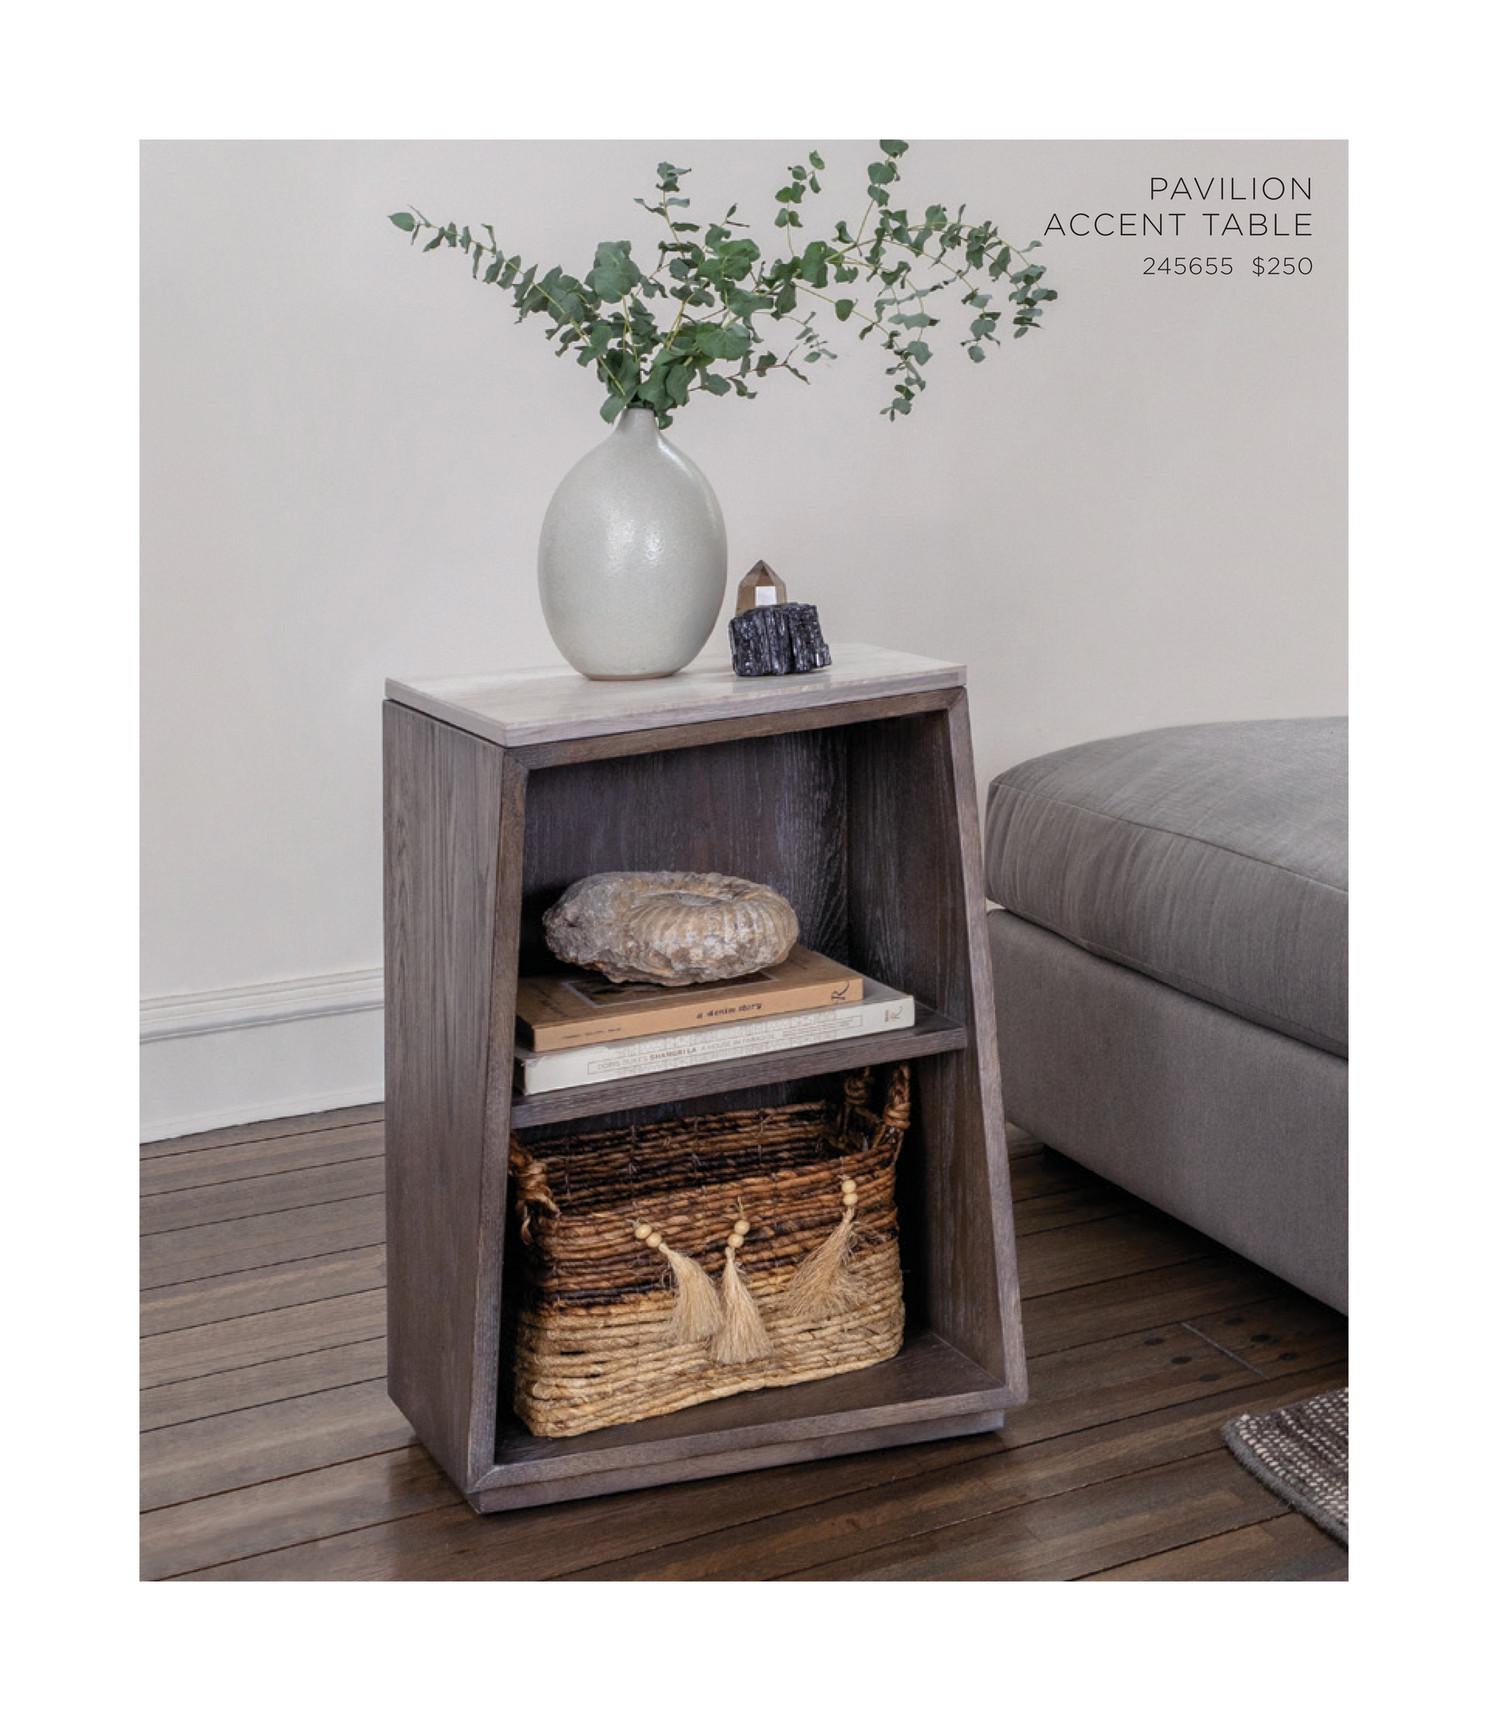 Pleasant Living Spaces Nate Jeremiah For Living Spaces Lookbook Lamtechconsult Wood Chair Design Ideas Lamtechconsultcom